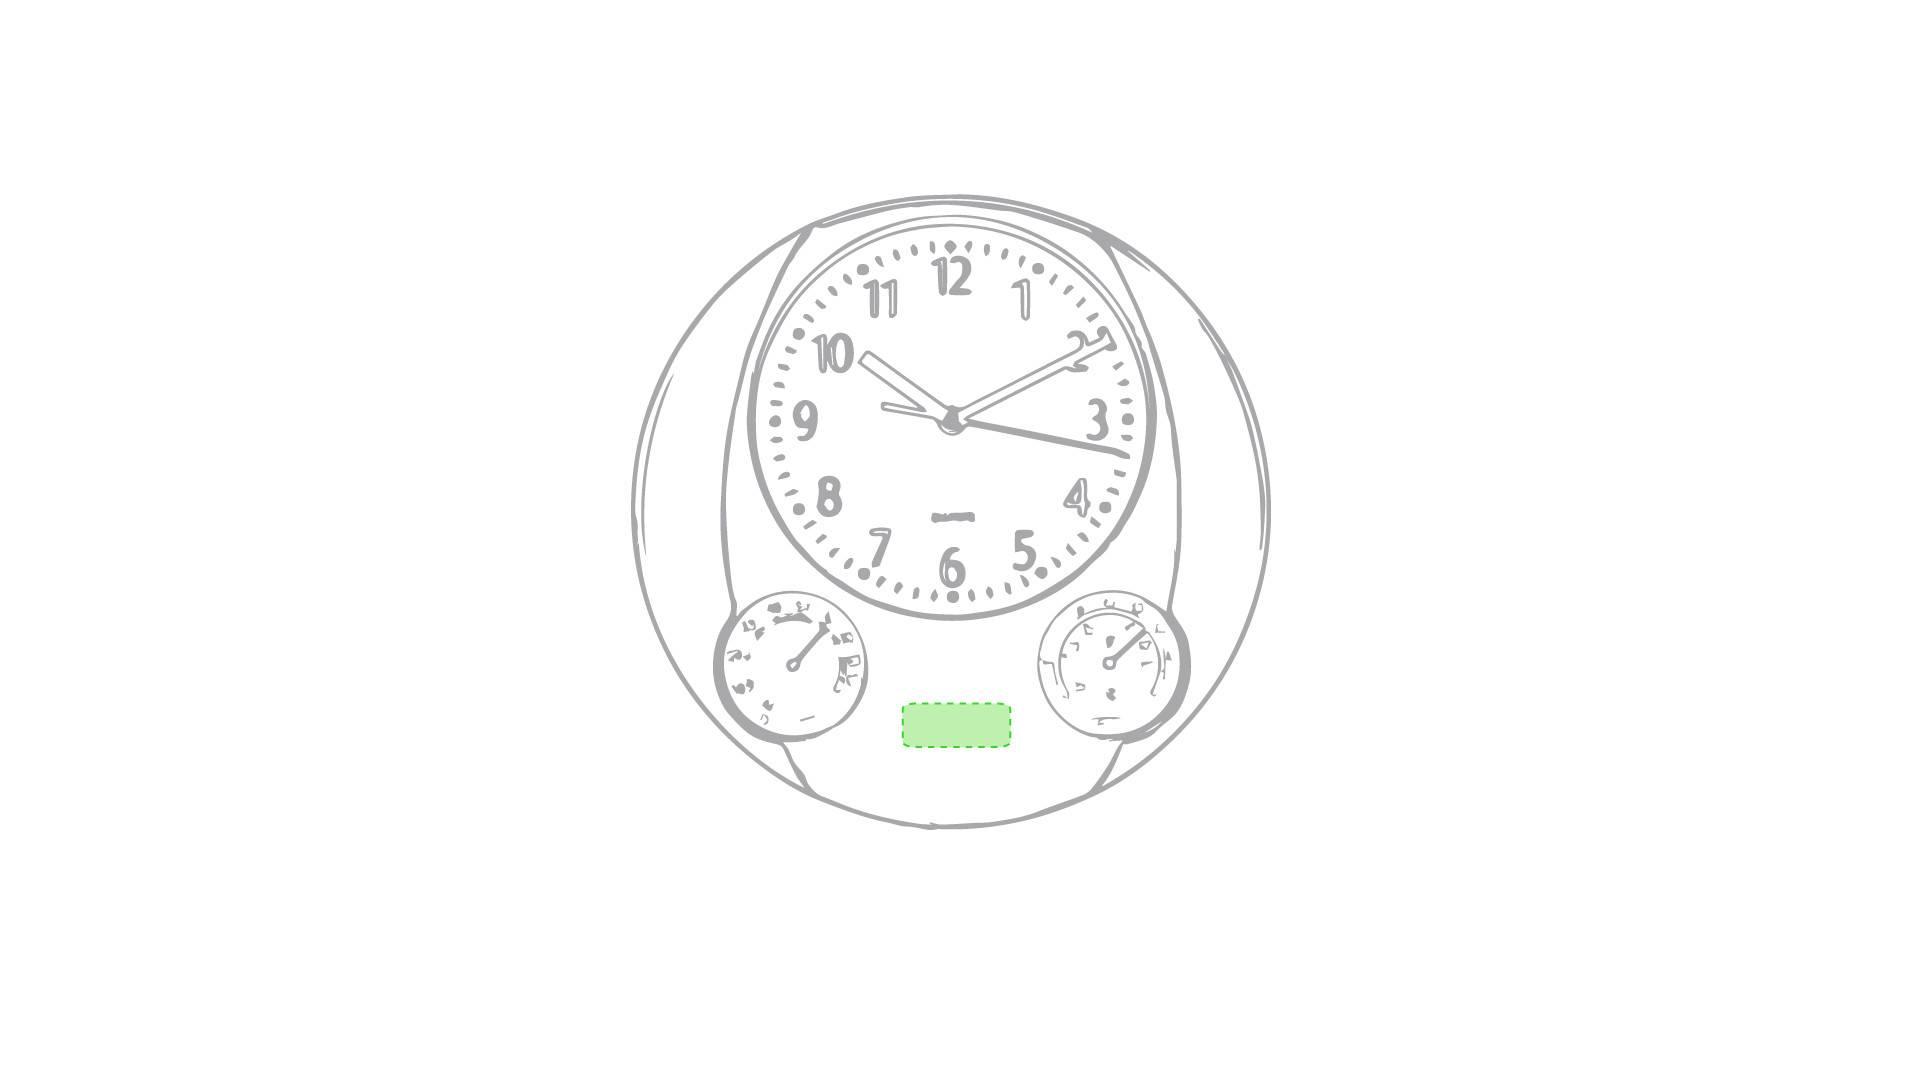 Reloj de pared con termómetro 4